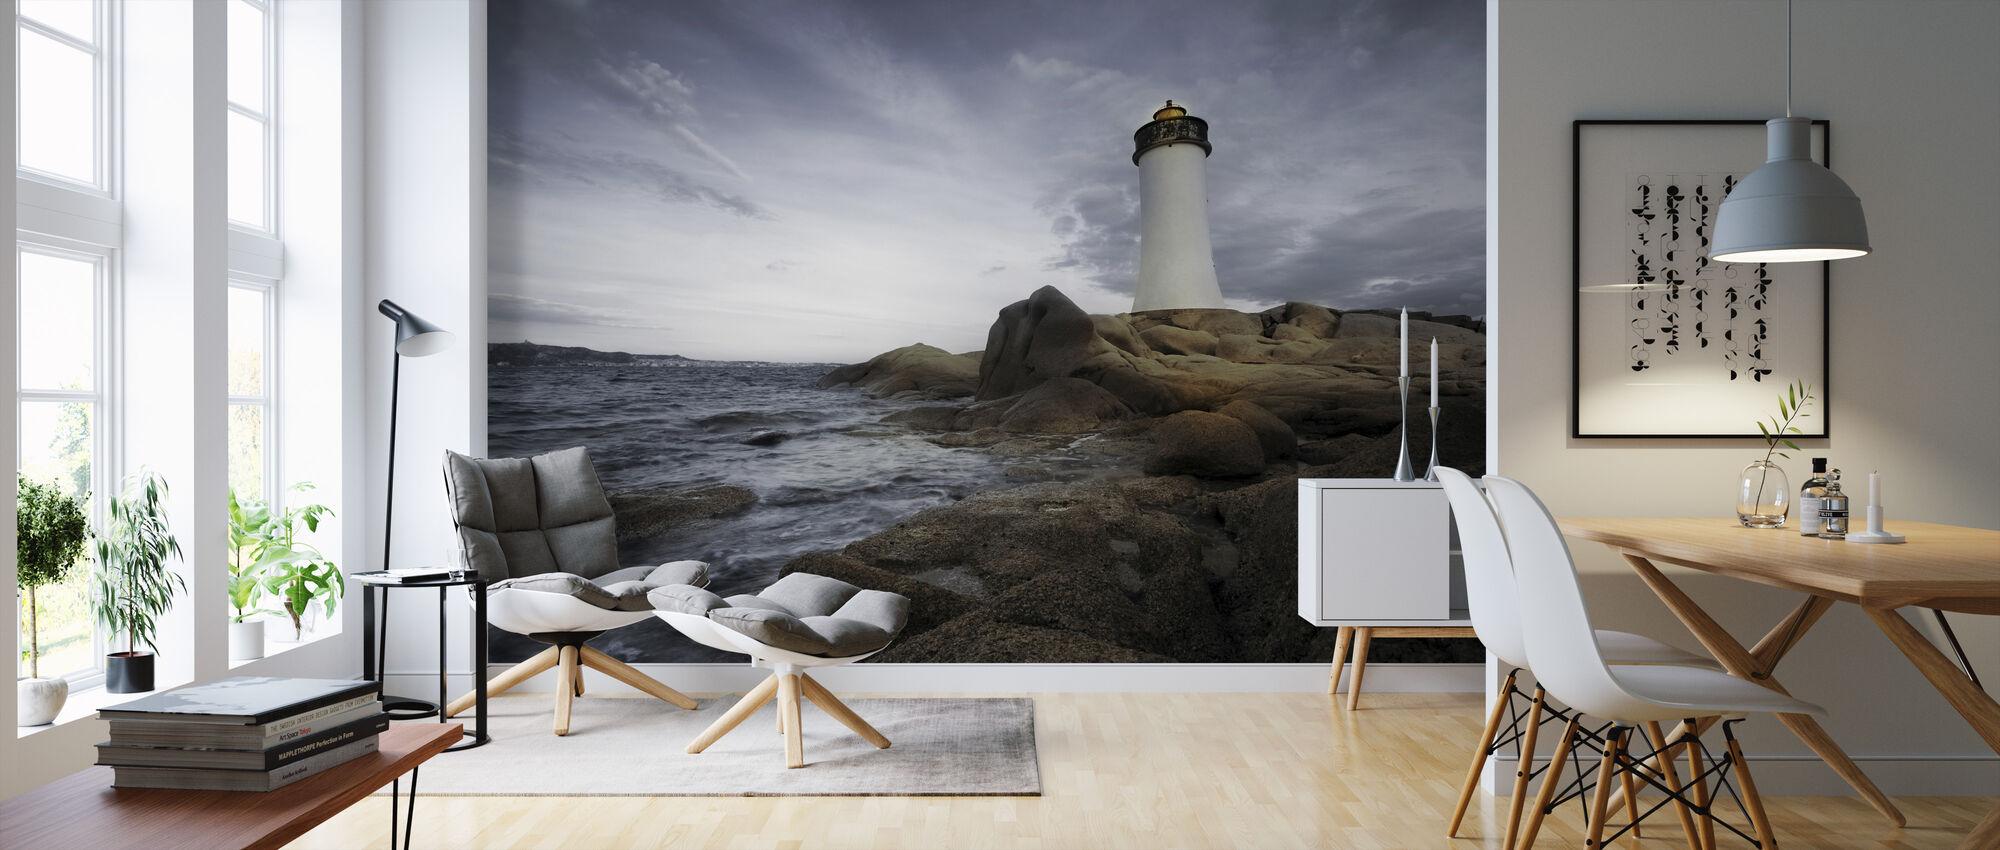 Sardinia Lighthouse - Wallpaper - Living Room